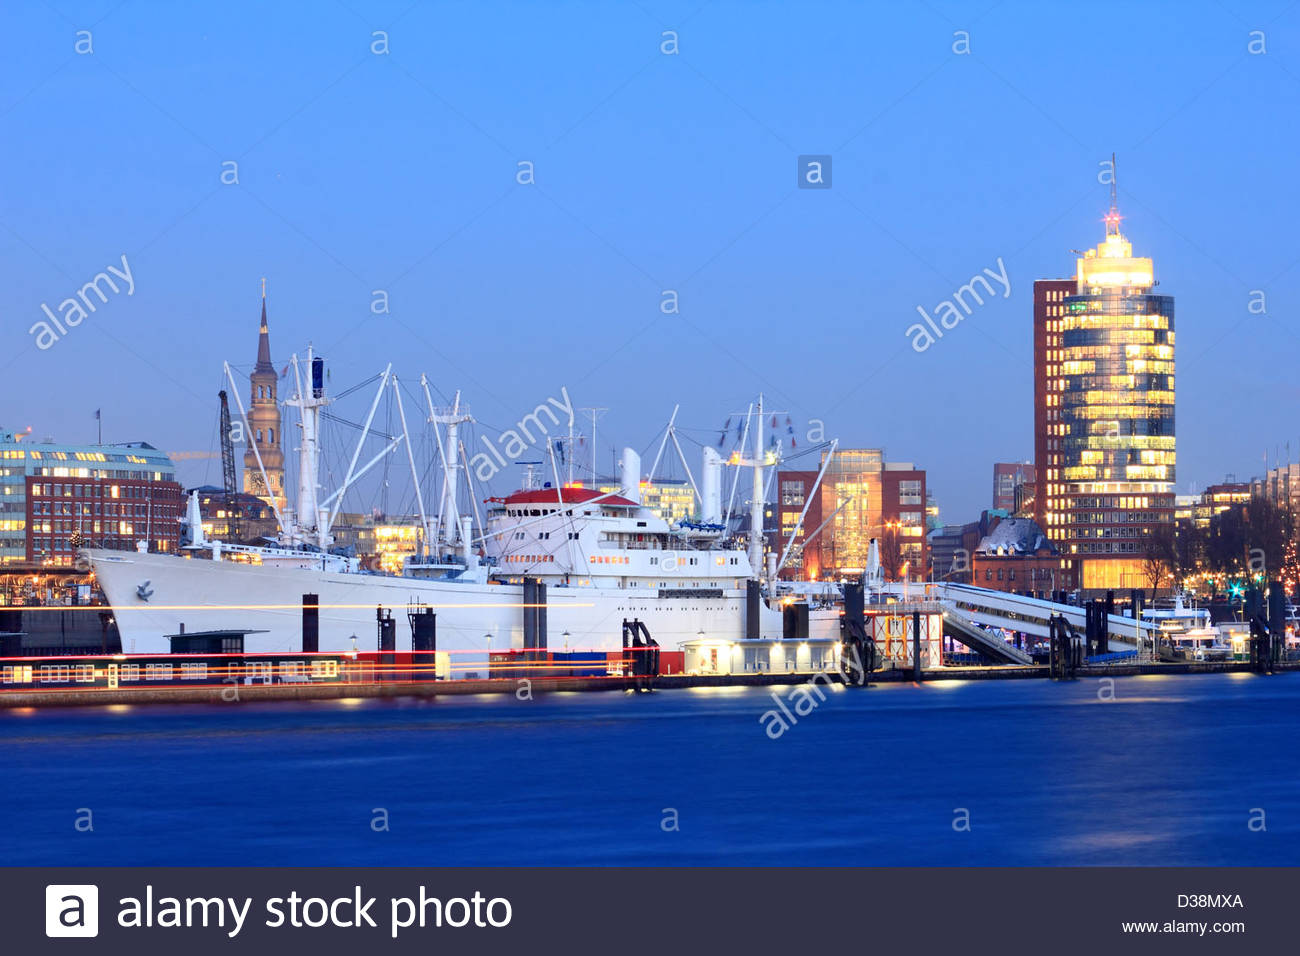 Urban harbor lit up at night - Stock Image